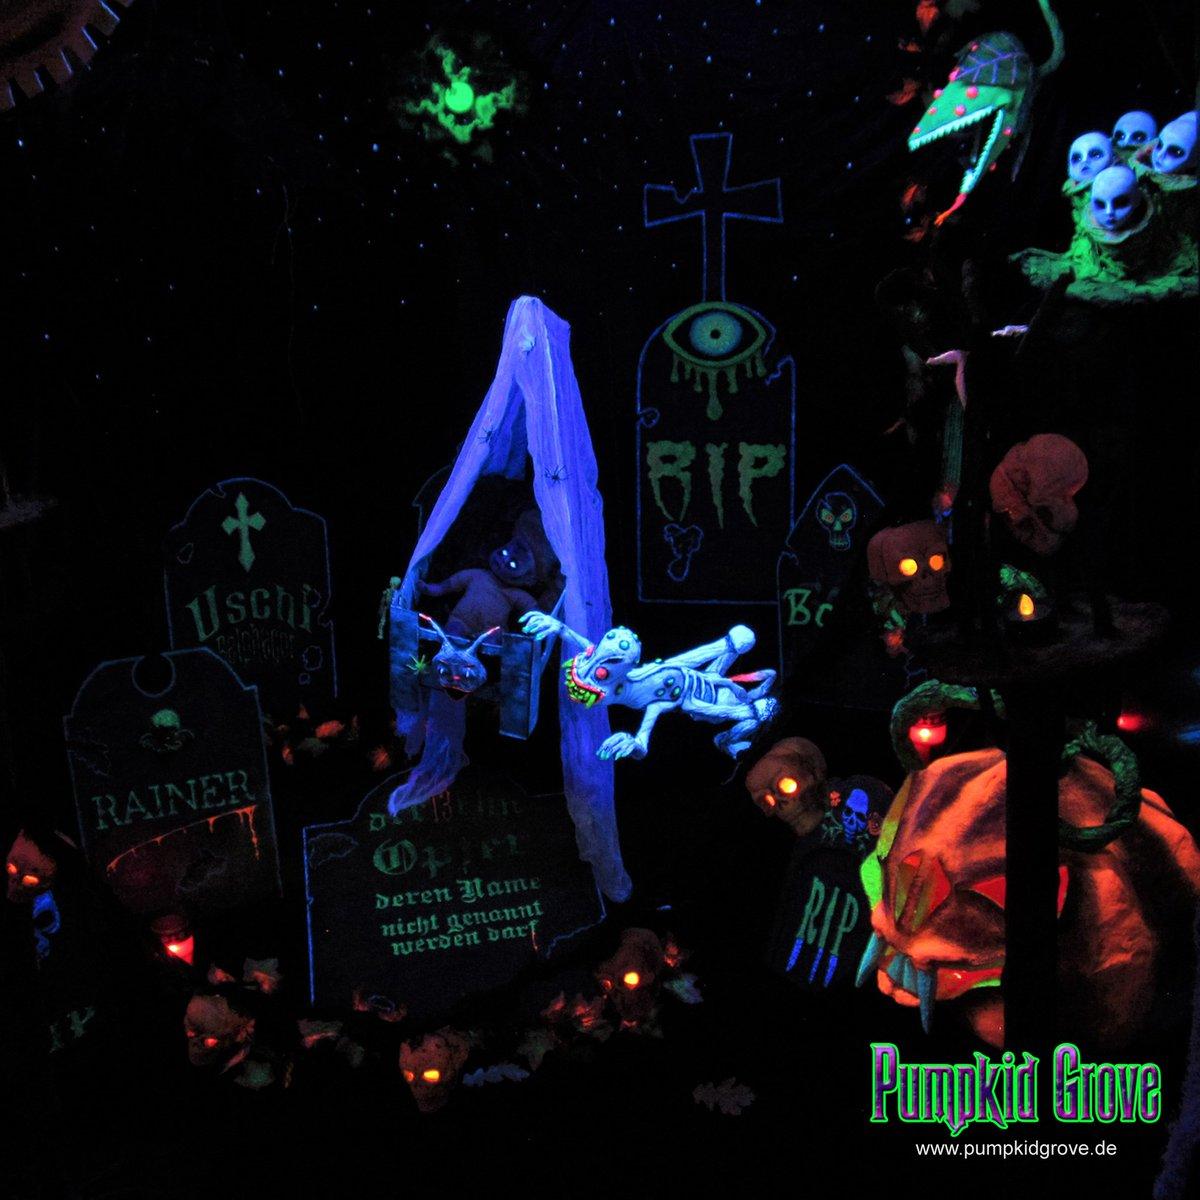 Seelenfänger Soul catcher  #halloween2017 #halloween #samhain #thenurseryofthefanaticaldrnightmare #friedhof #graveyard #grabstein #geist #ghost #kürbis #pumpkin #gruselig #haunted #horror #homehaunt #party #love #fun #art #germany #pumpkidgrove #pumpkidgrovegermany